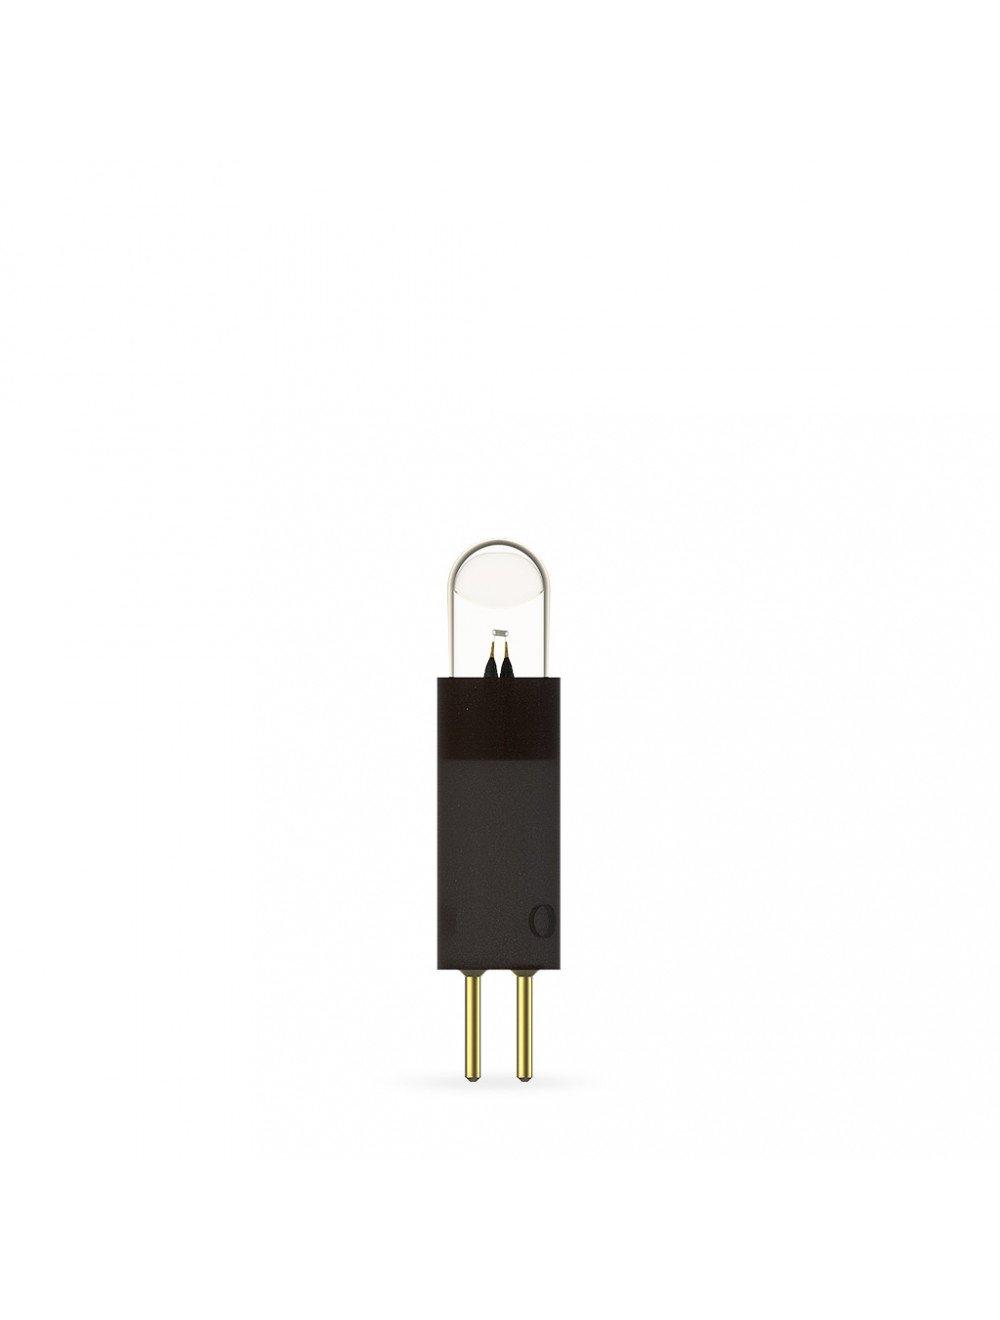 Das Produkt MK-dent Xenon Lampe BU7012BAK aus dem Global-dent online shop.